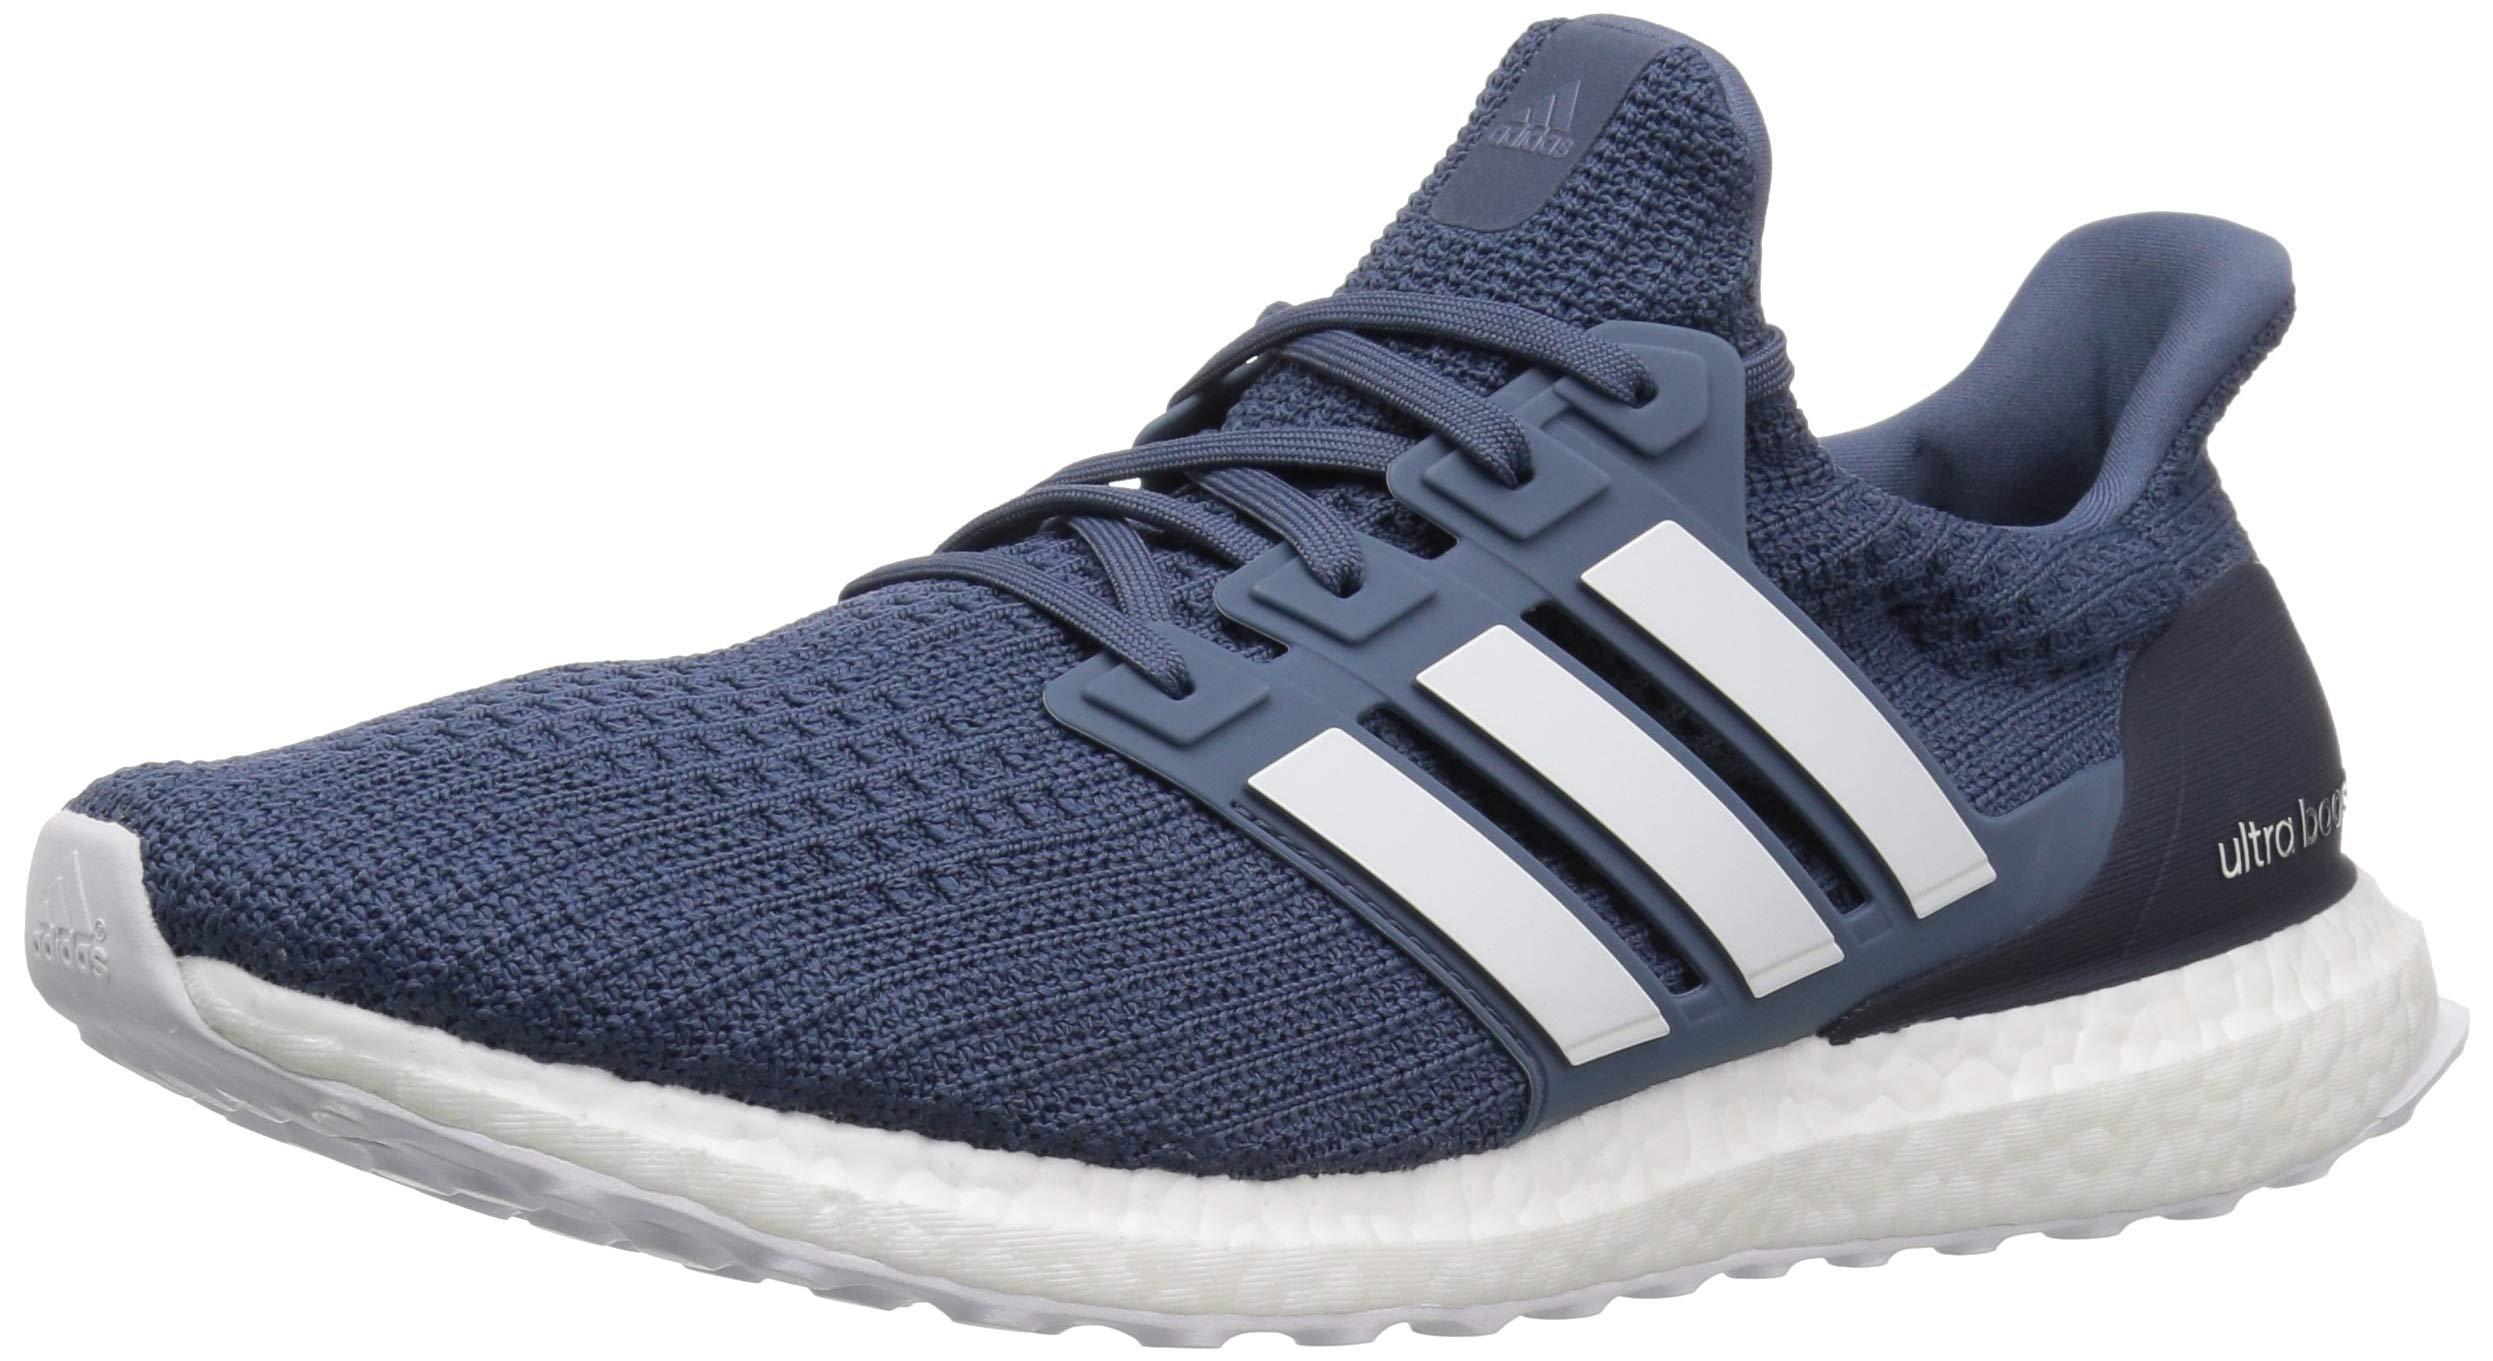 adidas Men's Ultraboost Running Shoe tech Ink/Cloud White/Vapour Grey 7.5 M US